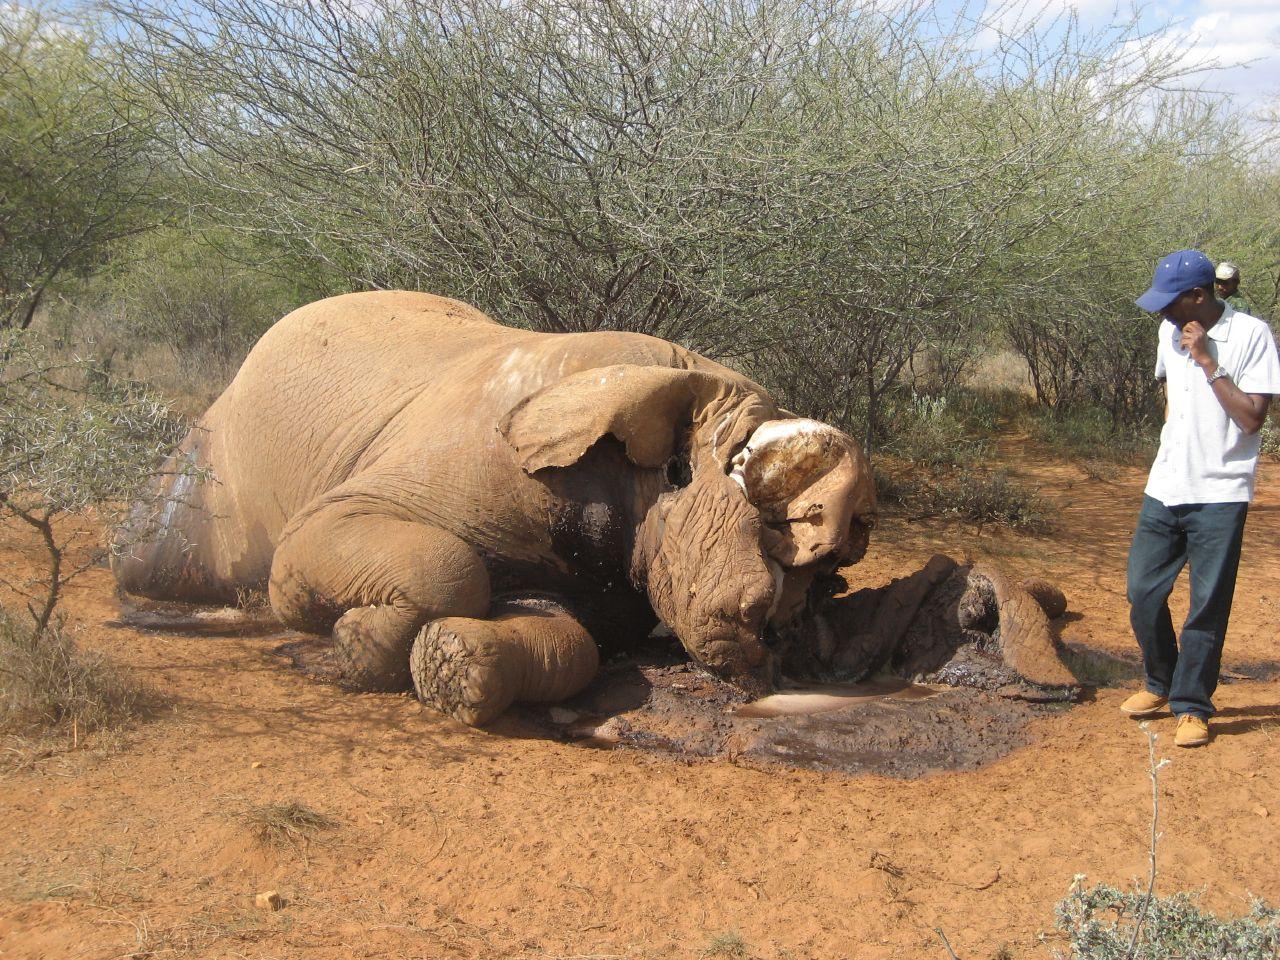 Elephant poached in Kenya. Credit: Elain e